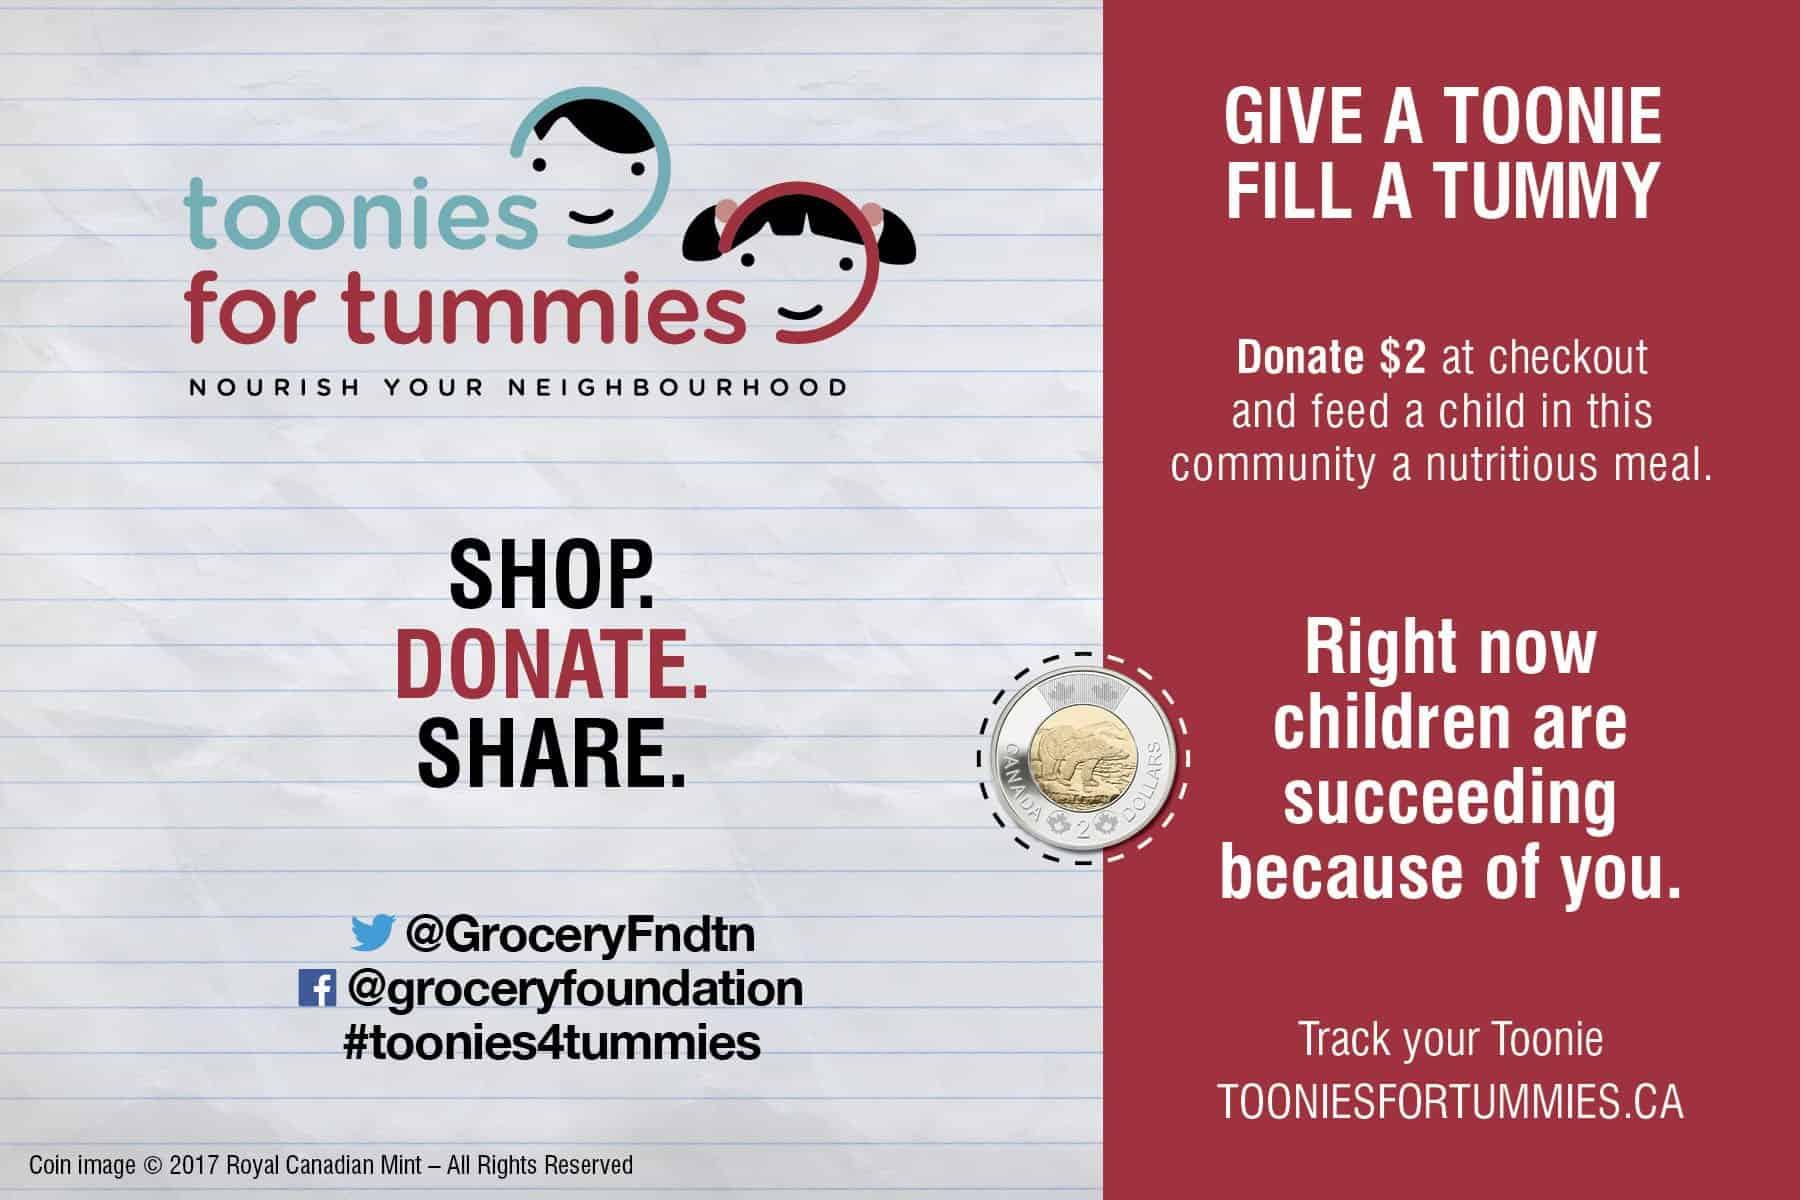 The Grocery Foundation Toonies for Tummies #toonies4tummies